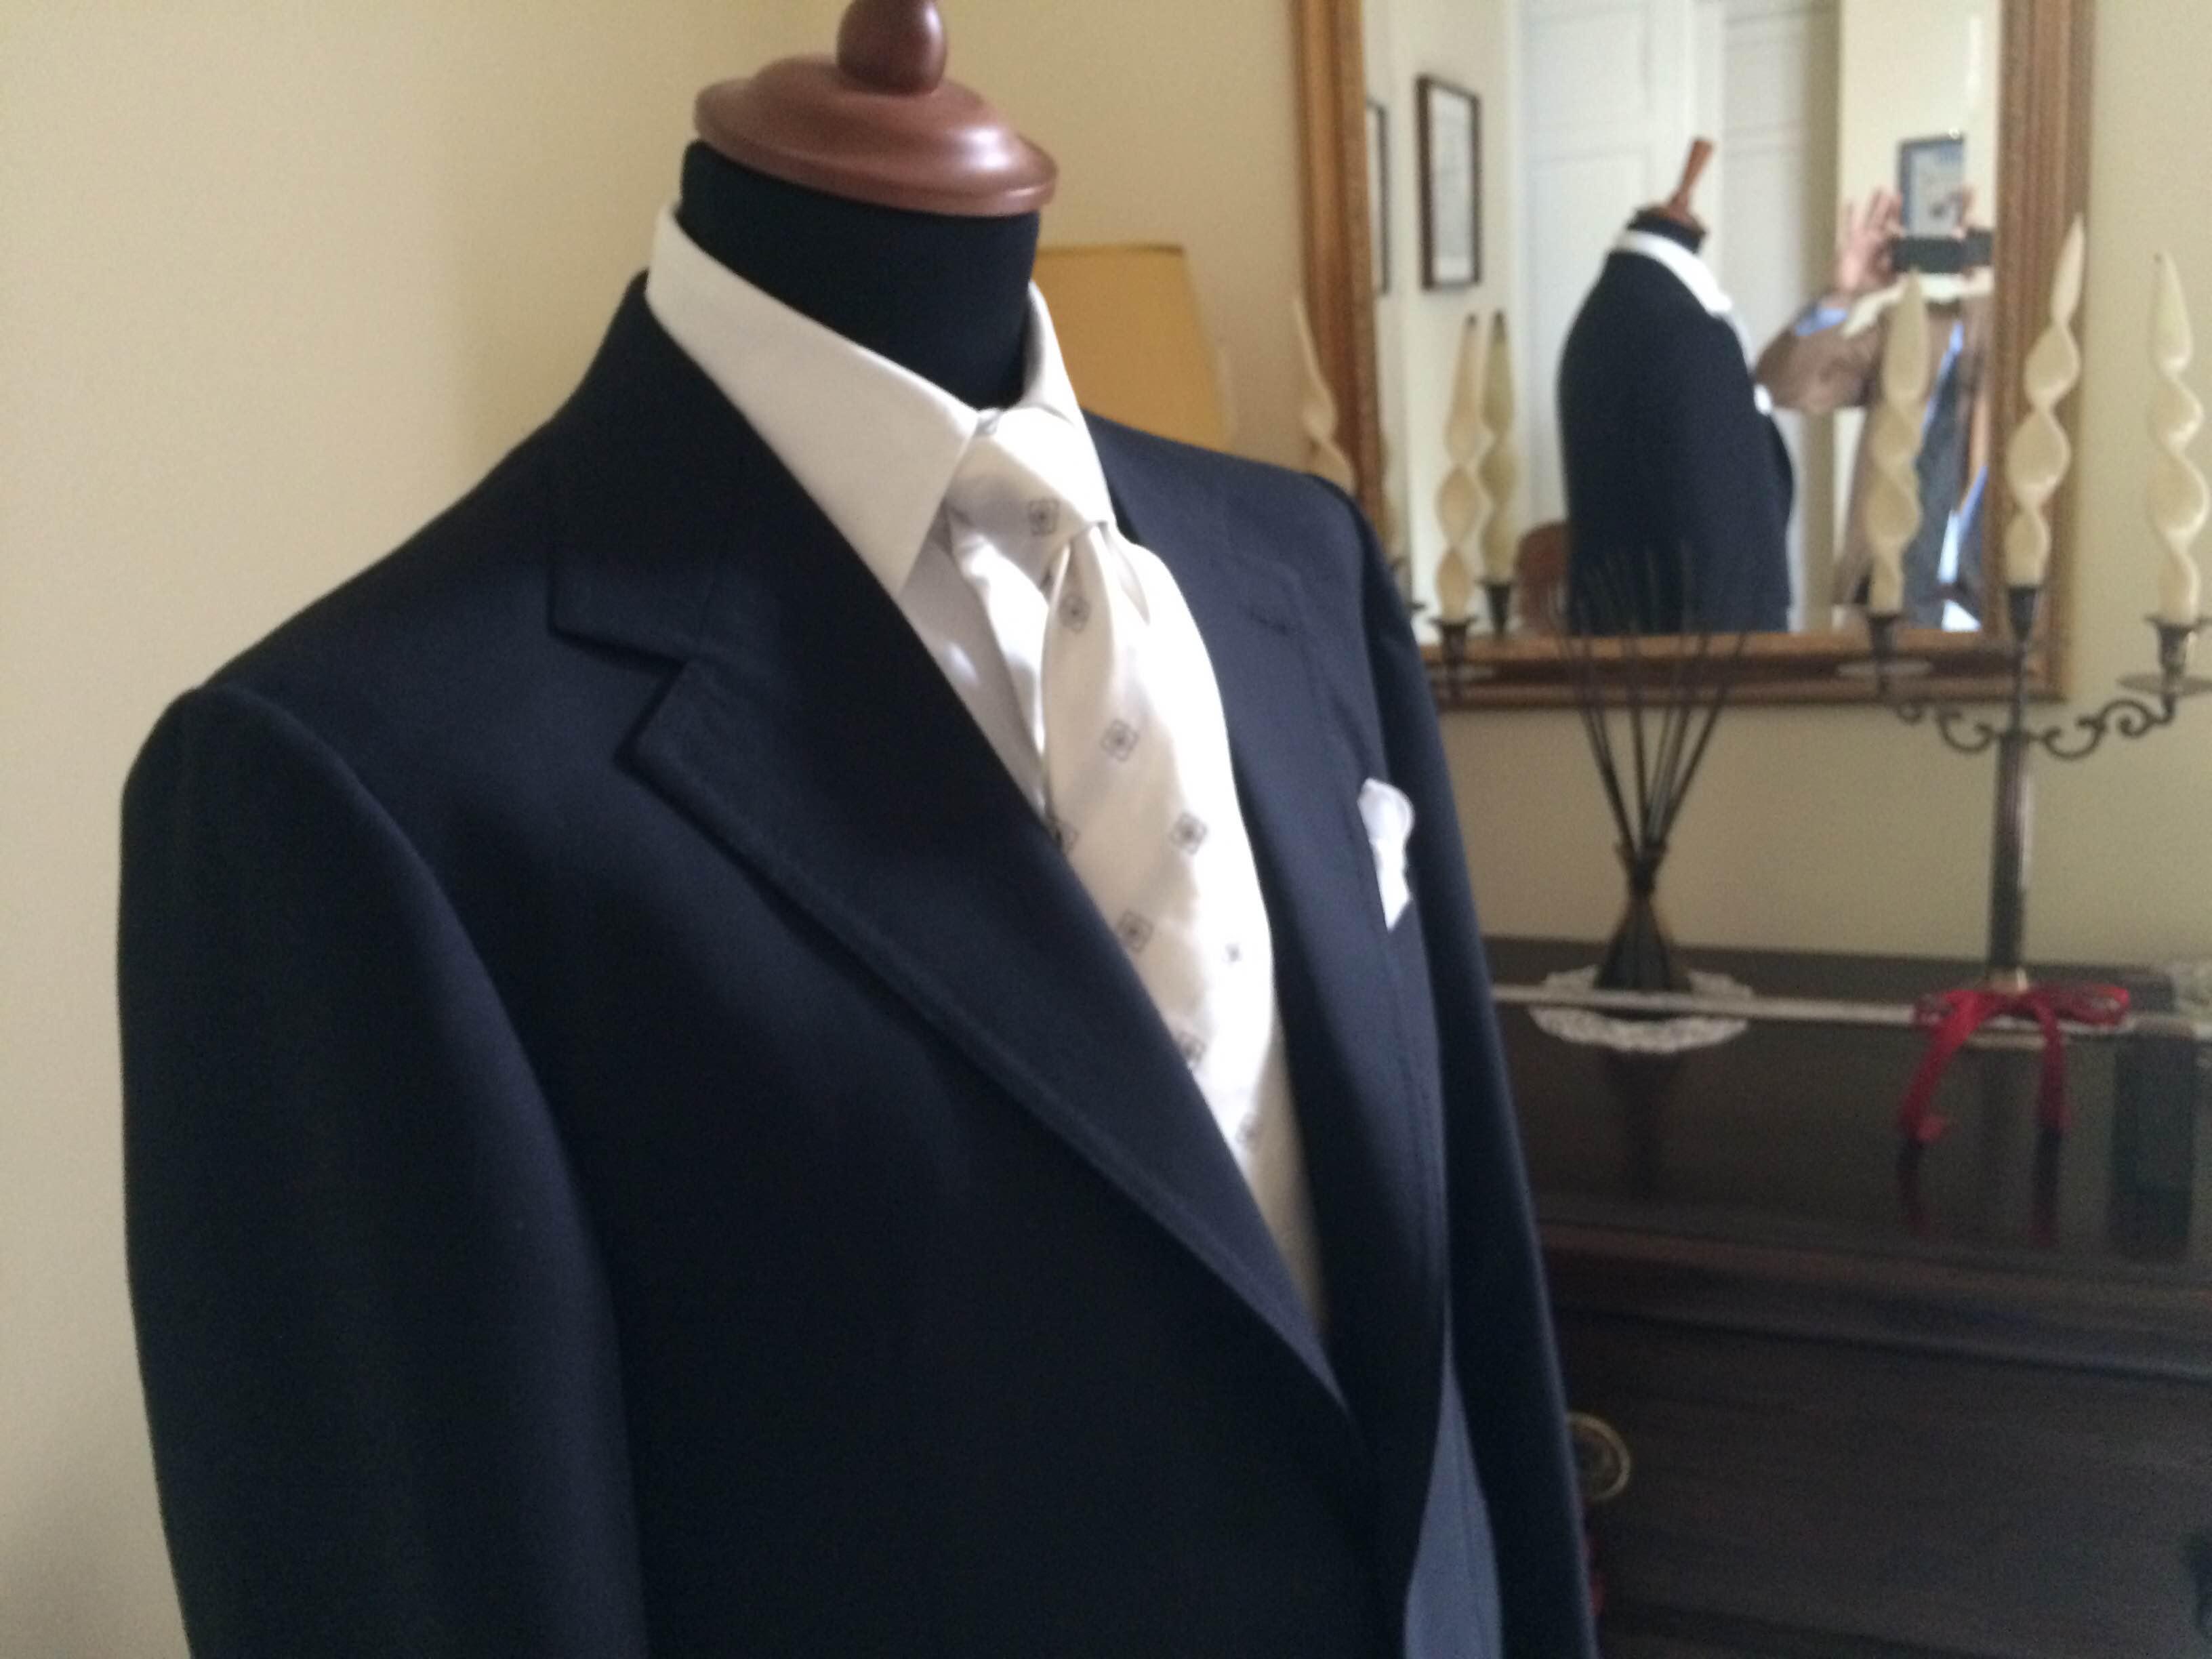 Abito blu da cerimonia sartoria napoletana Sartoria Antonelli, artigiano, sarto, sartoria lello antonelli, sartoria artigianale, abiti su misura, artigianato napoletano, napoli